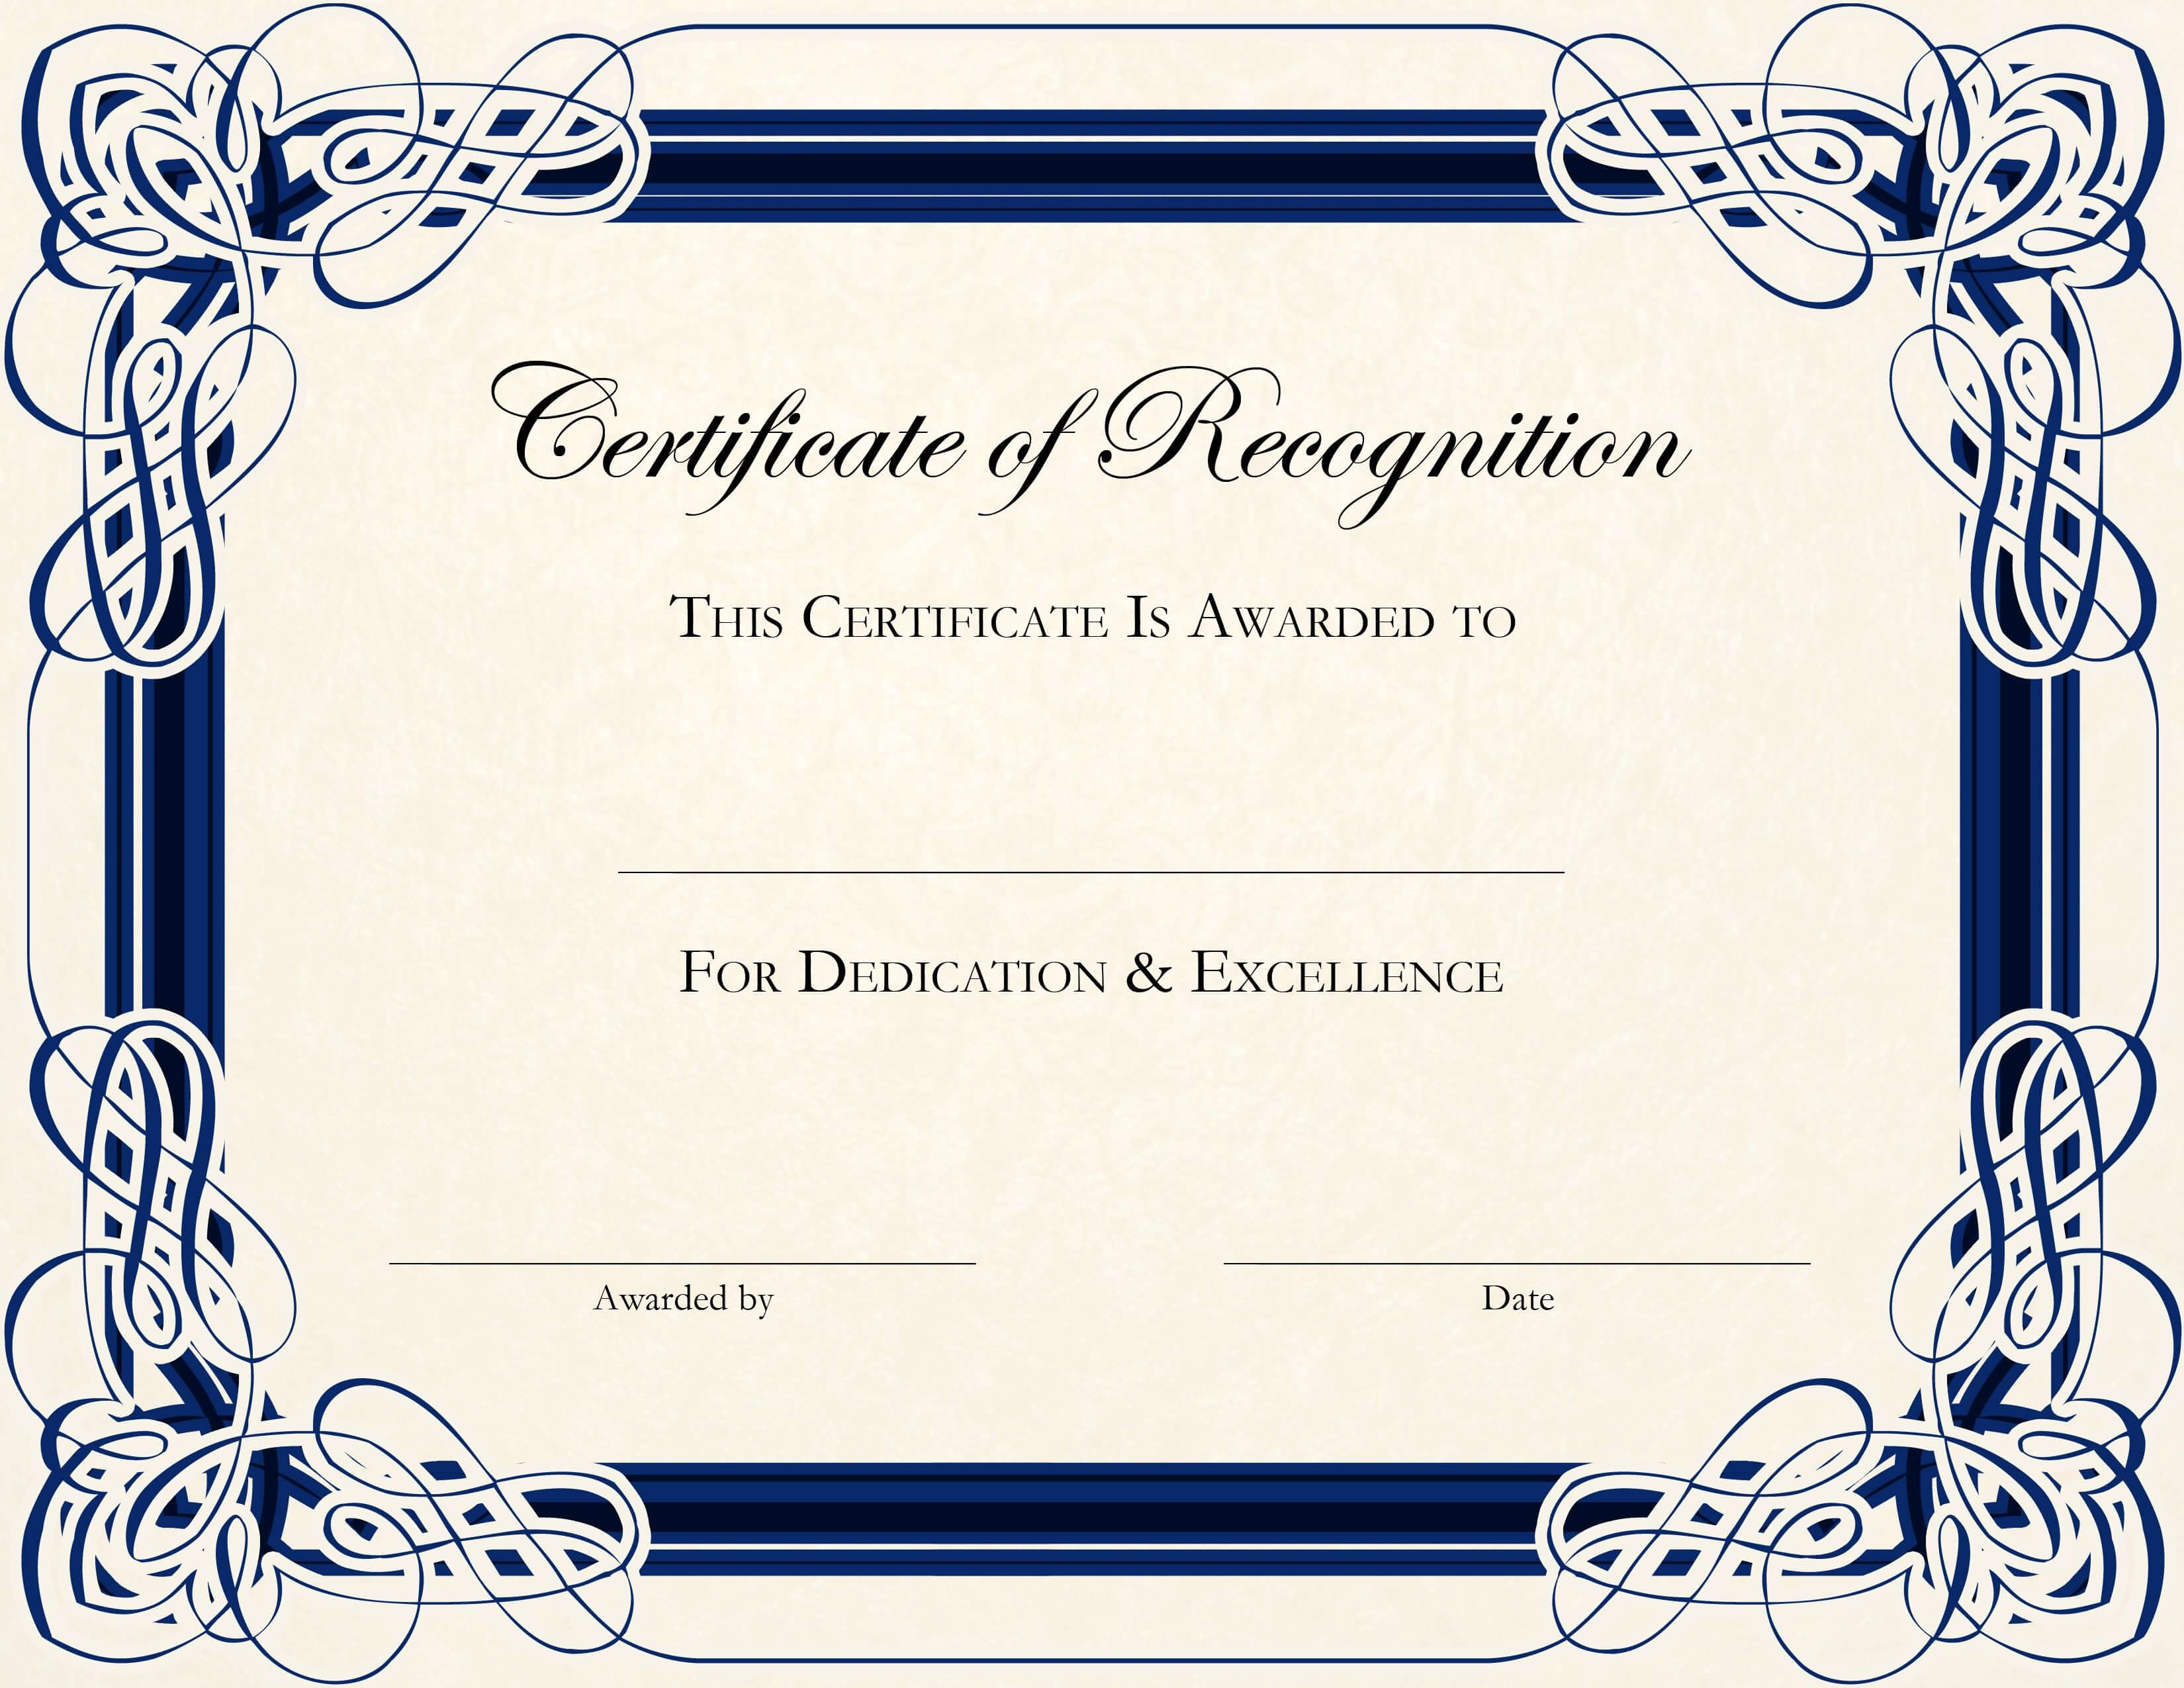 Free Printable Certificate Templates For Teachers Regarding Sports Award Certificate Template Word